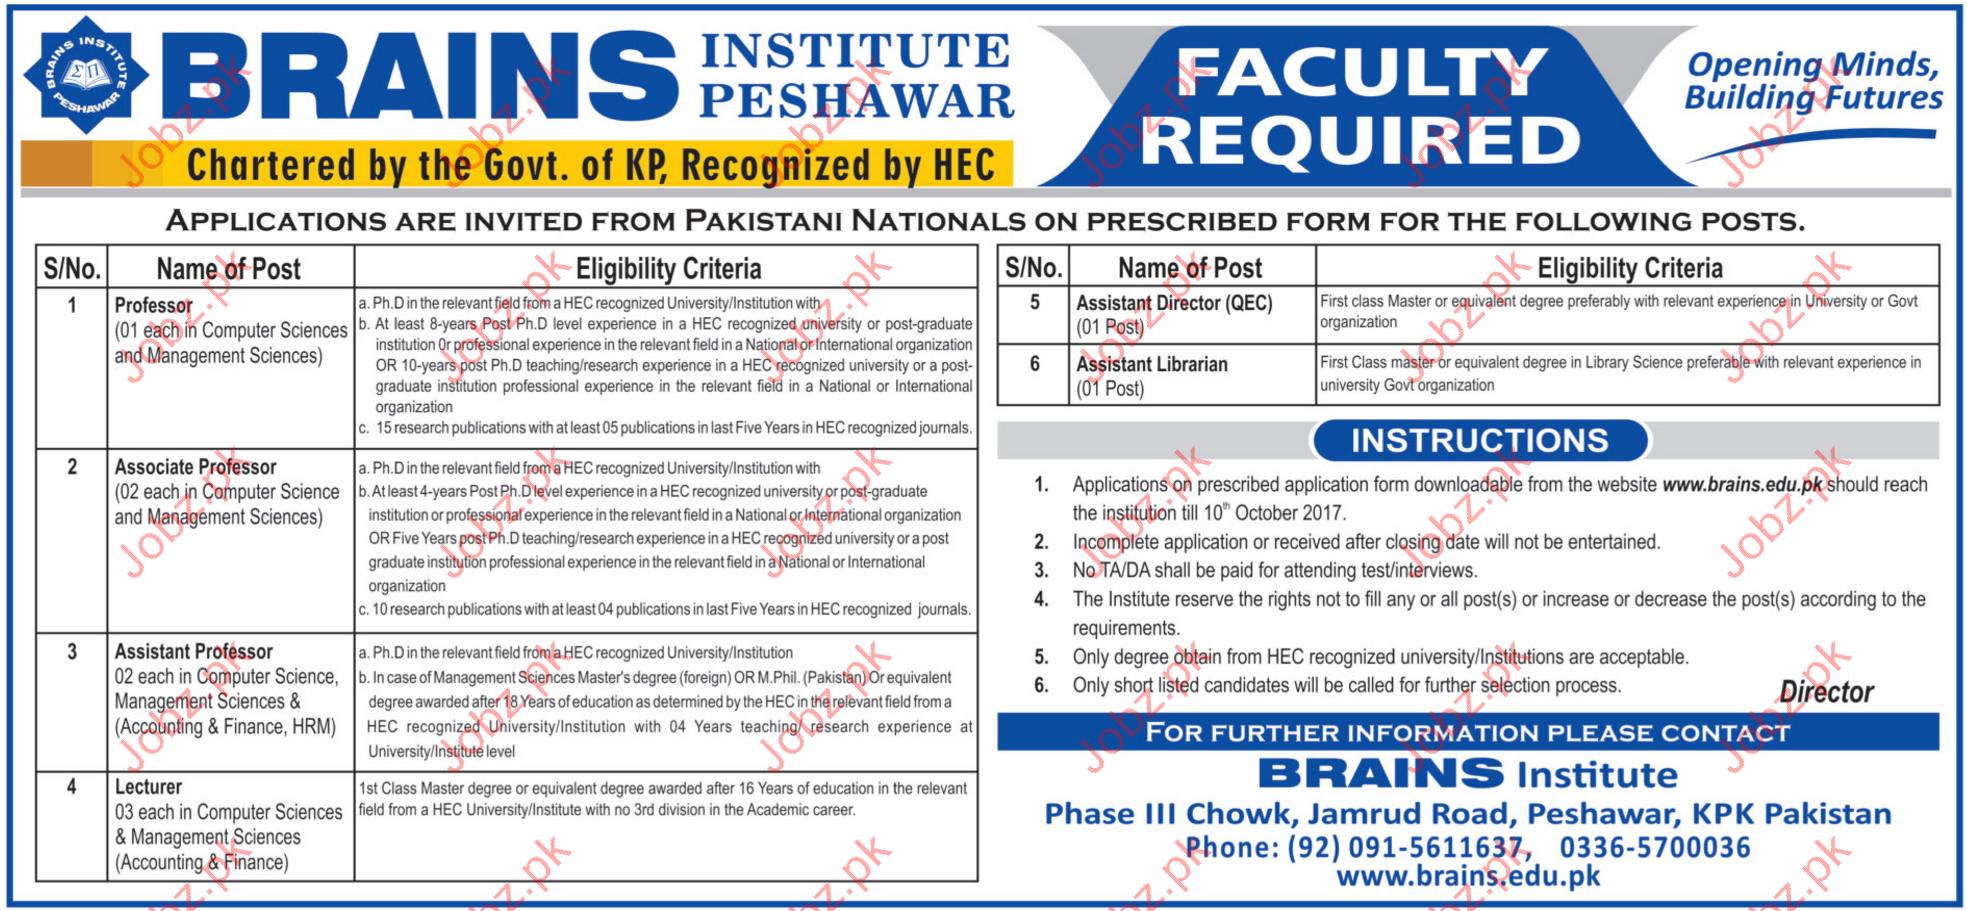 Brains Institute Peshawar Jobs Opportunity